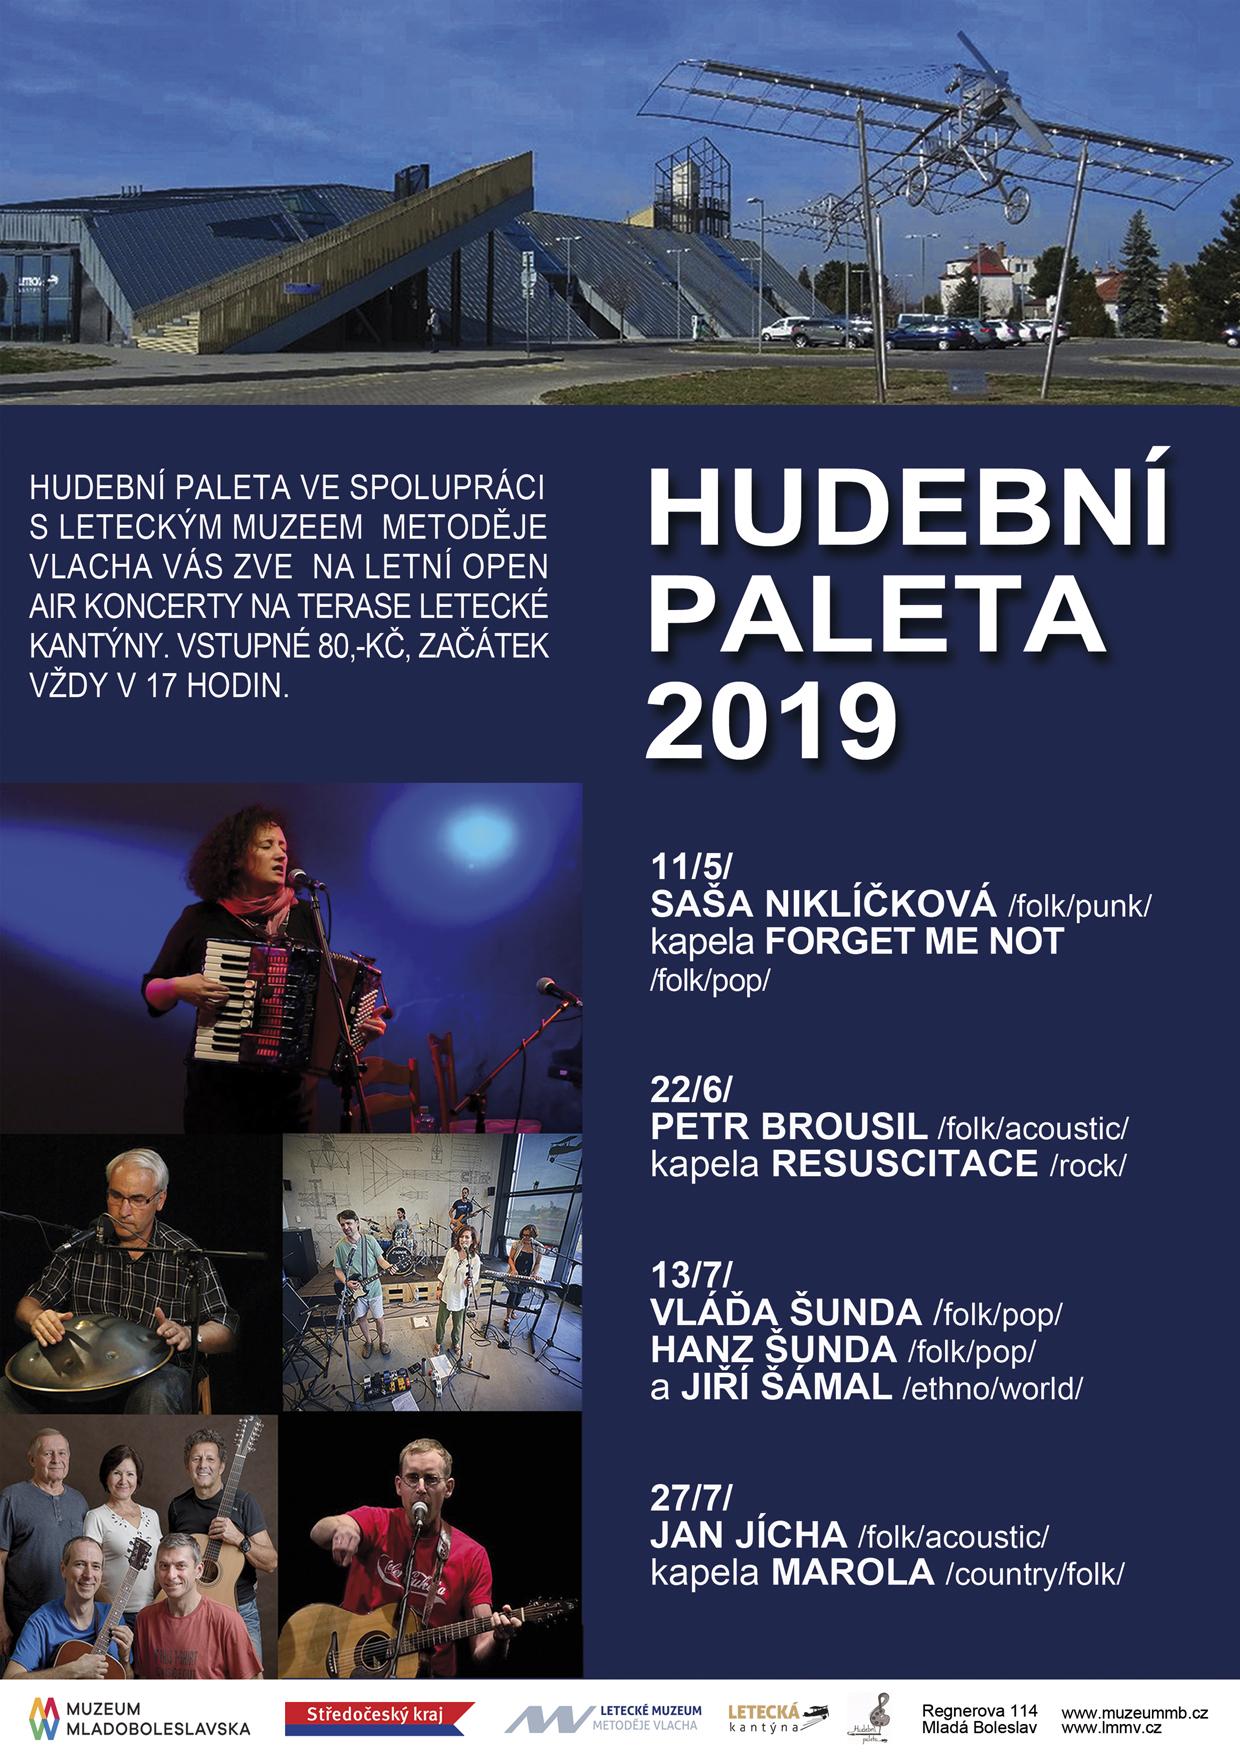 Hudební Paleta 2019 – Petr Brousil (folk/acoustic), kapela